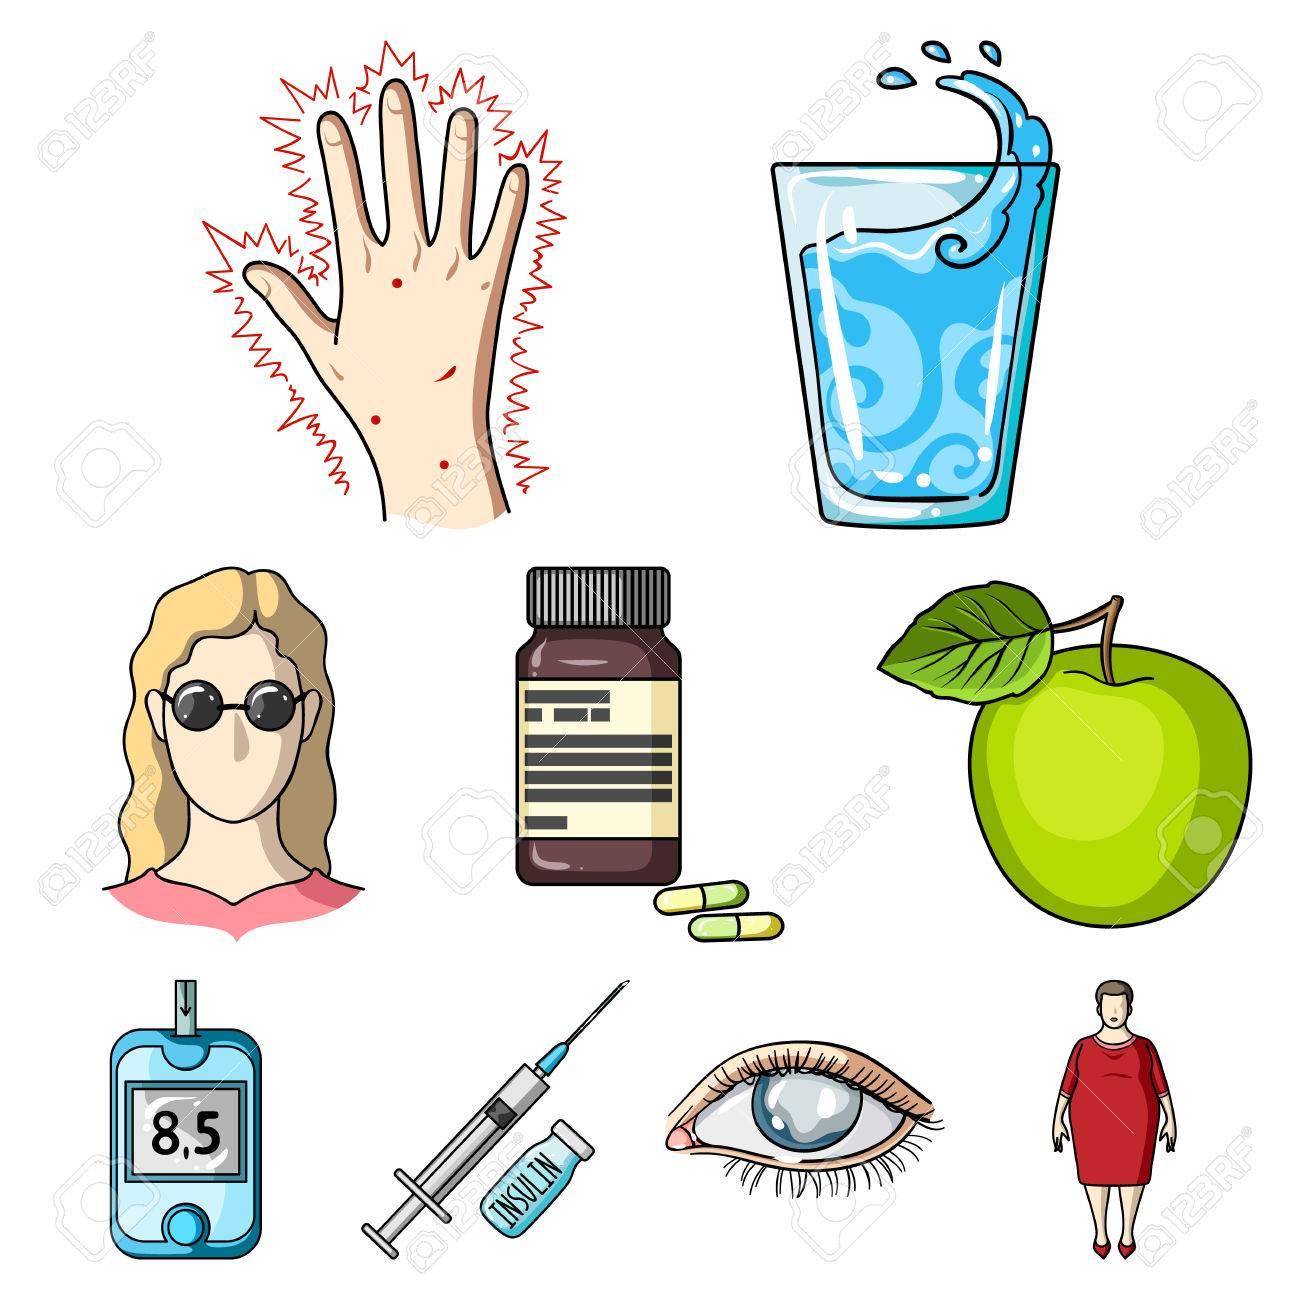 estocada tubercululosa síntomas de diabetes